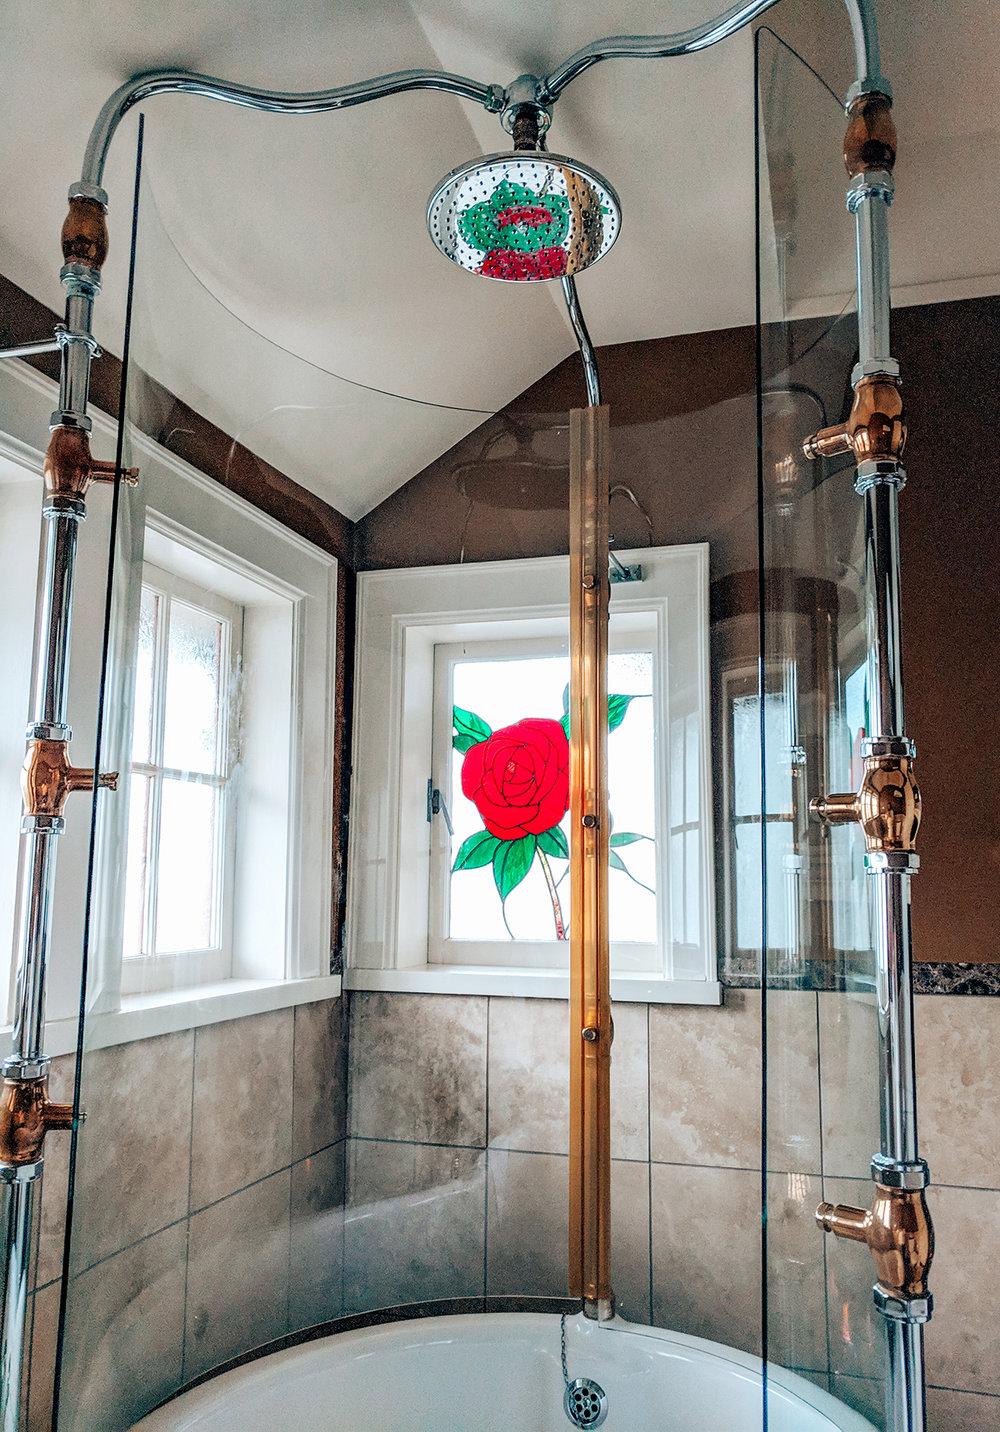 Abigails-bathroom-rain-shower.jpg